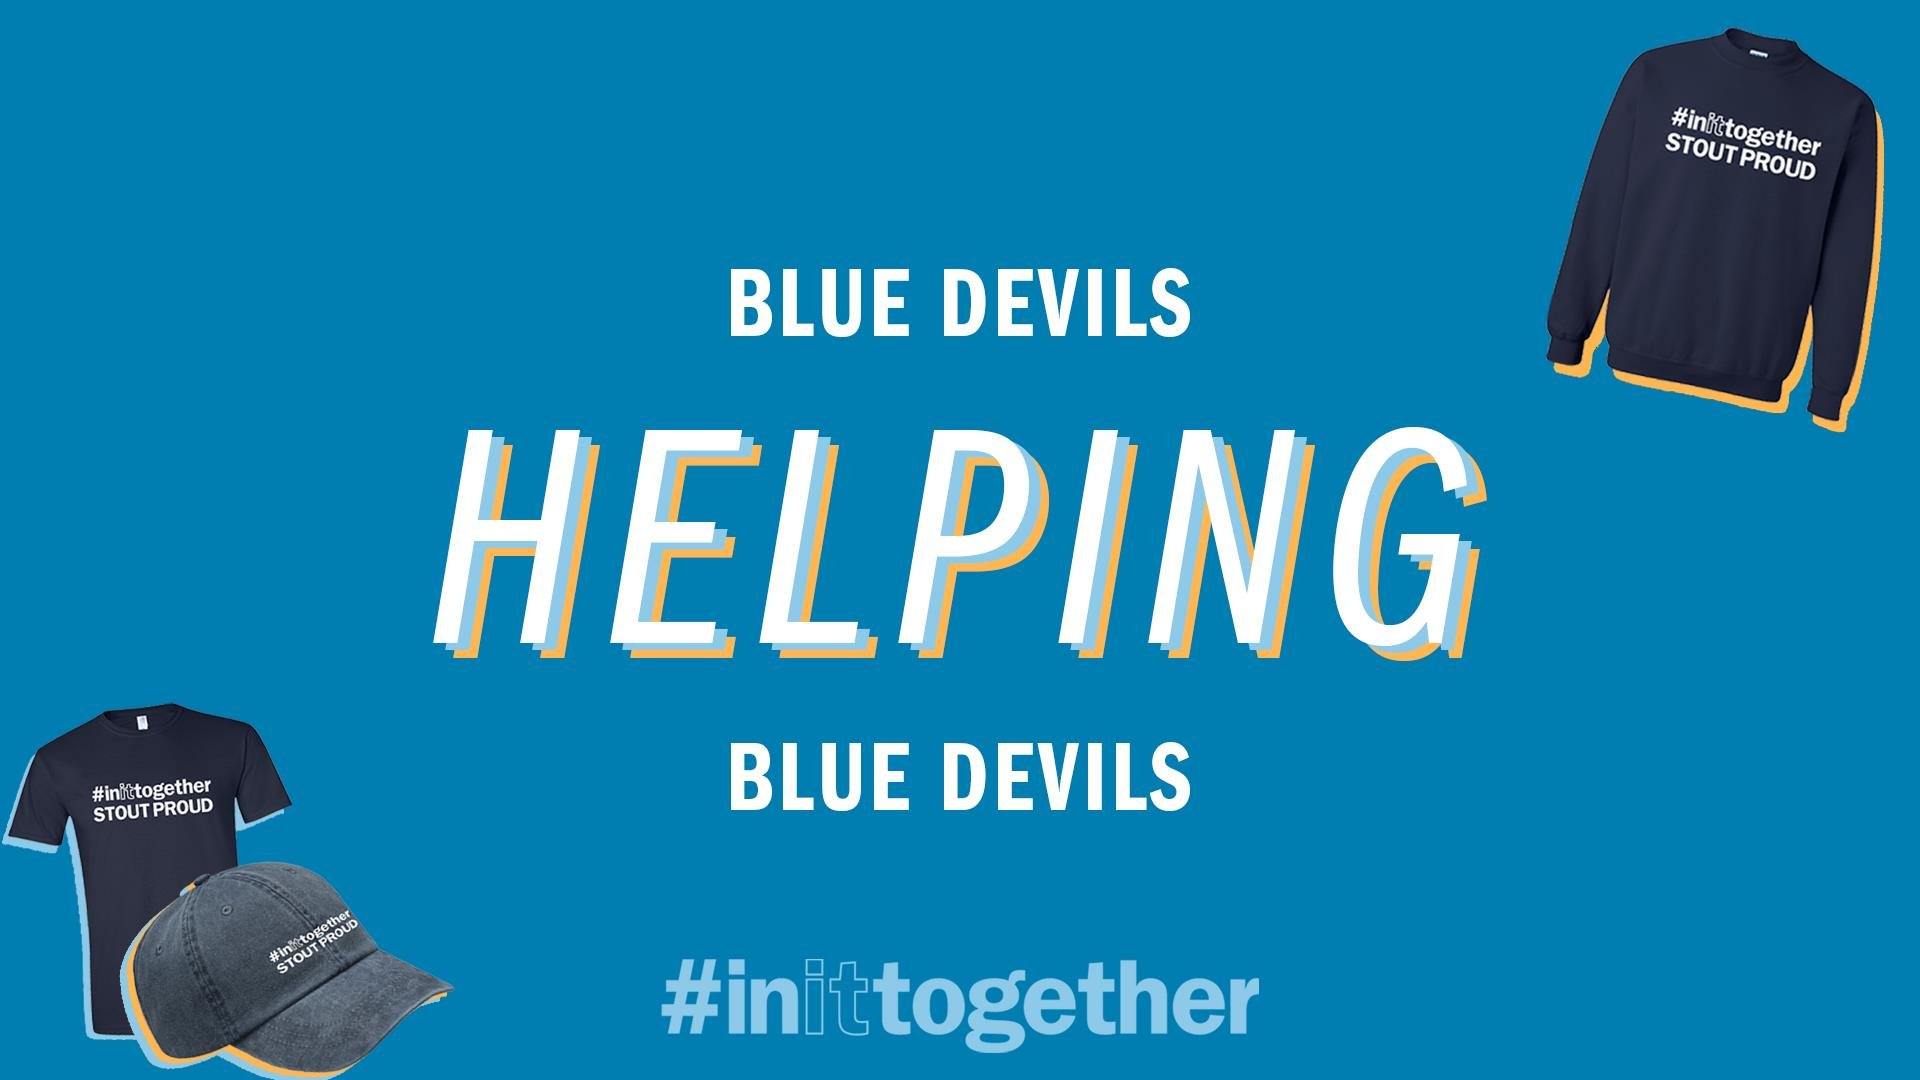 Blue box with text Blue Devils Helping Blue Devils and StoutProud apparel